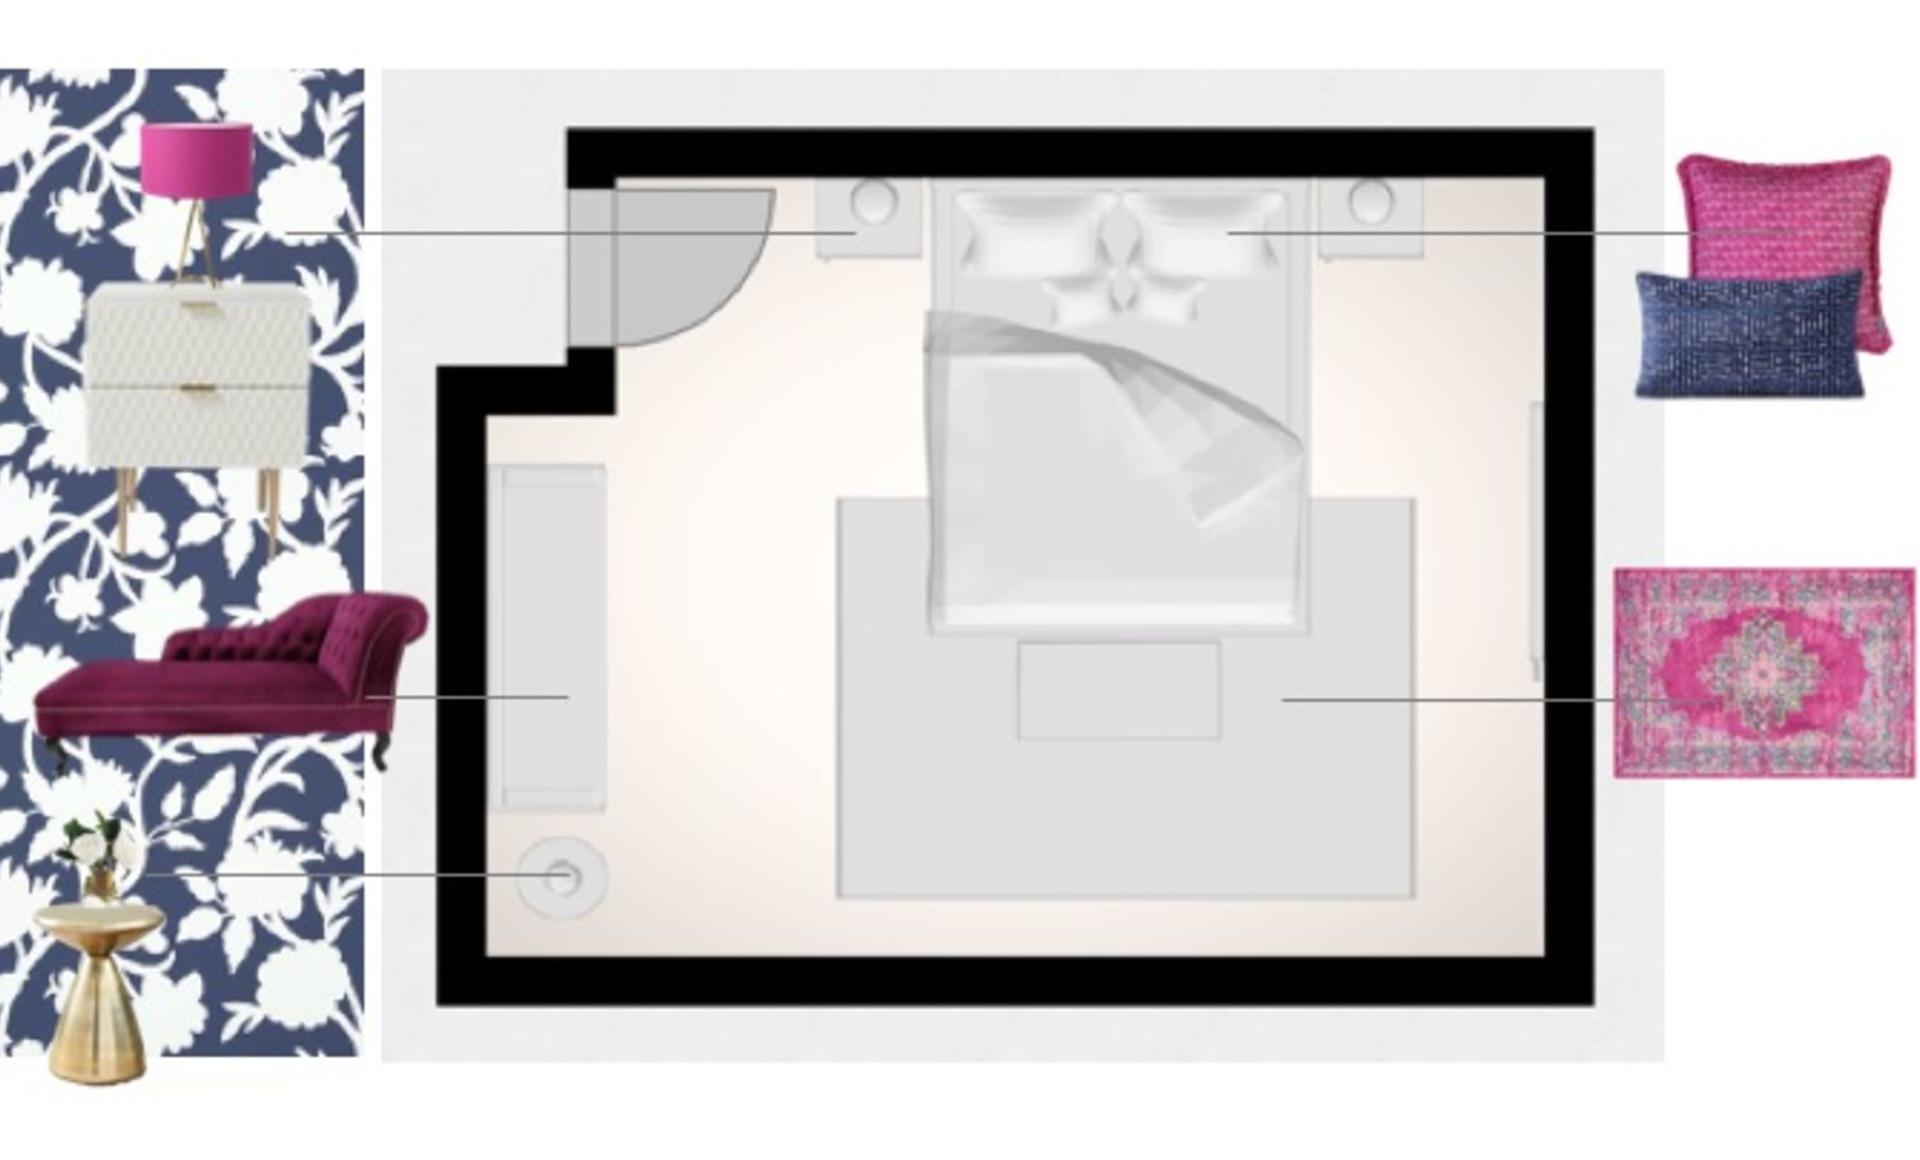 Mbr carolhanda guestbedroom01 floorplan